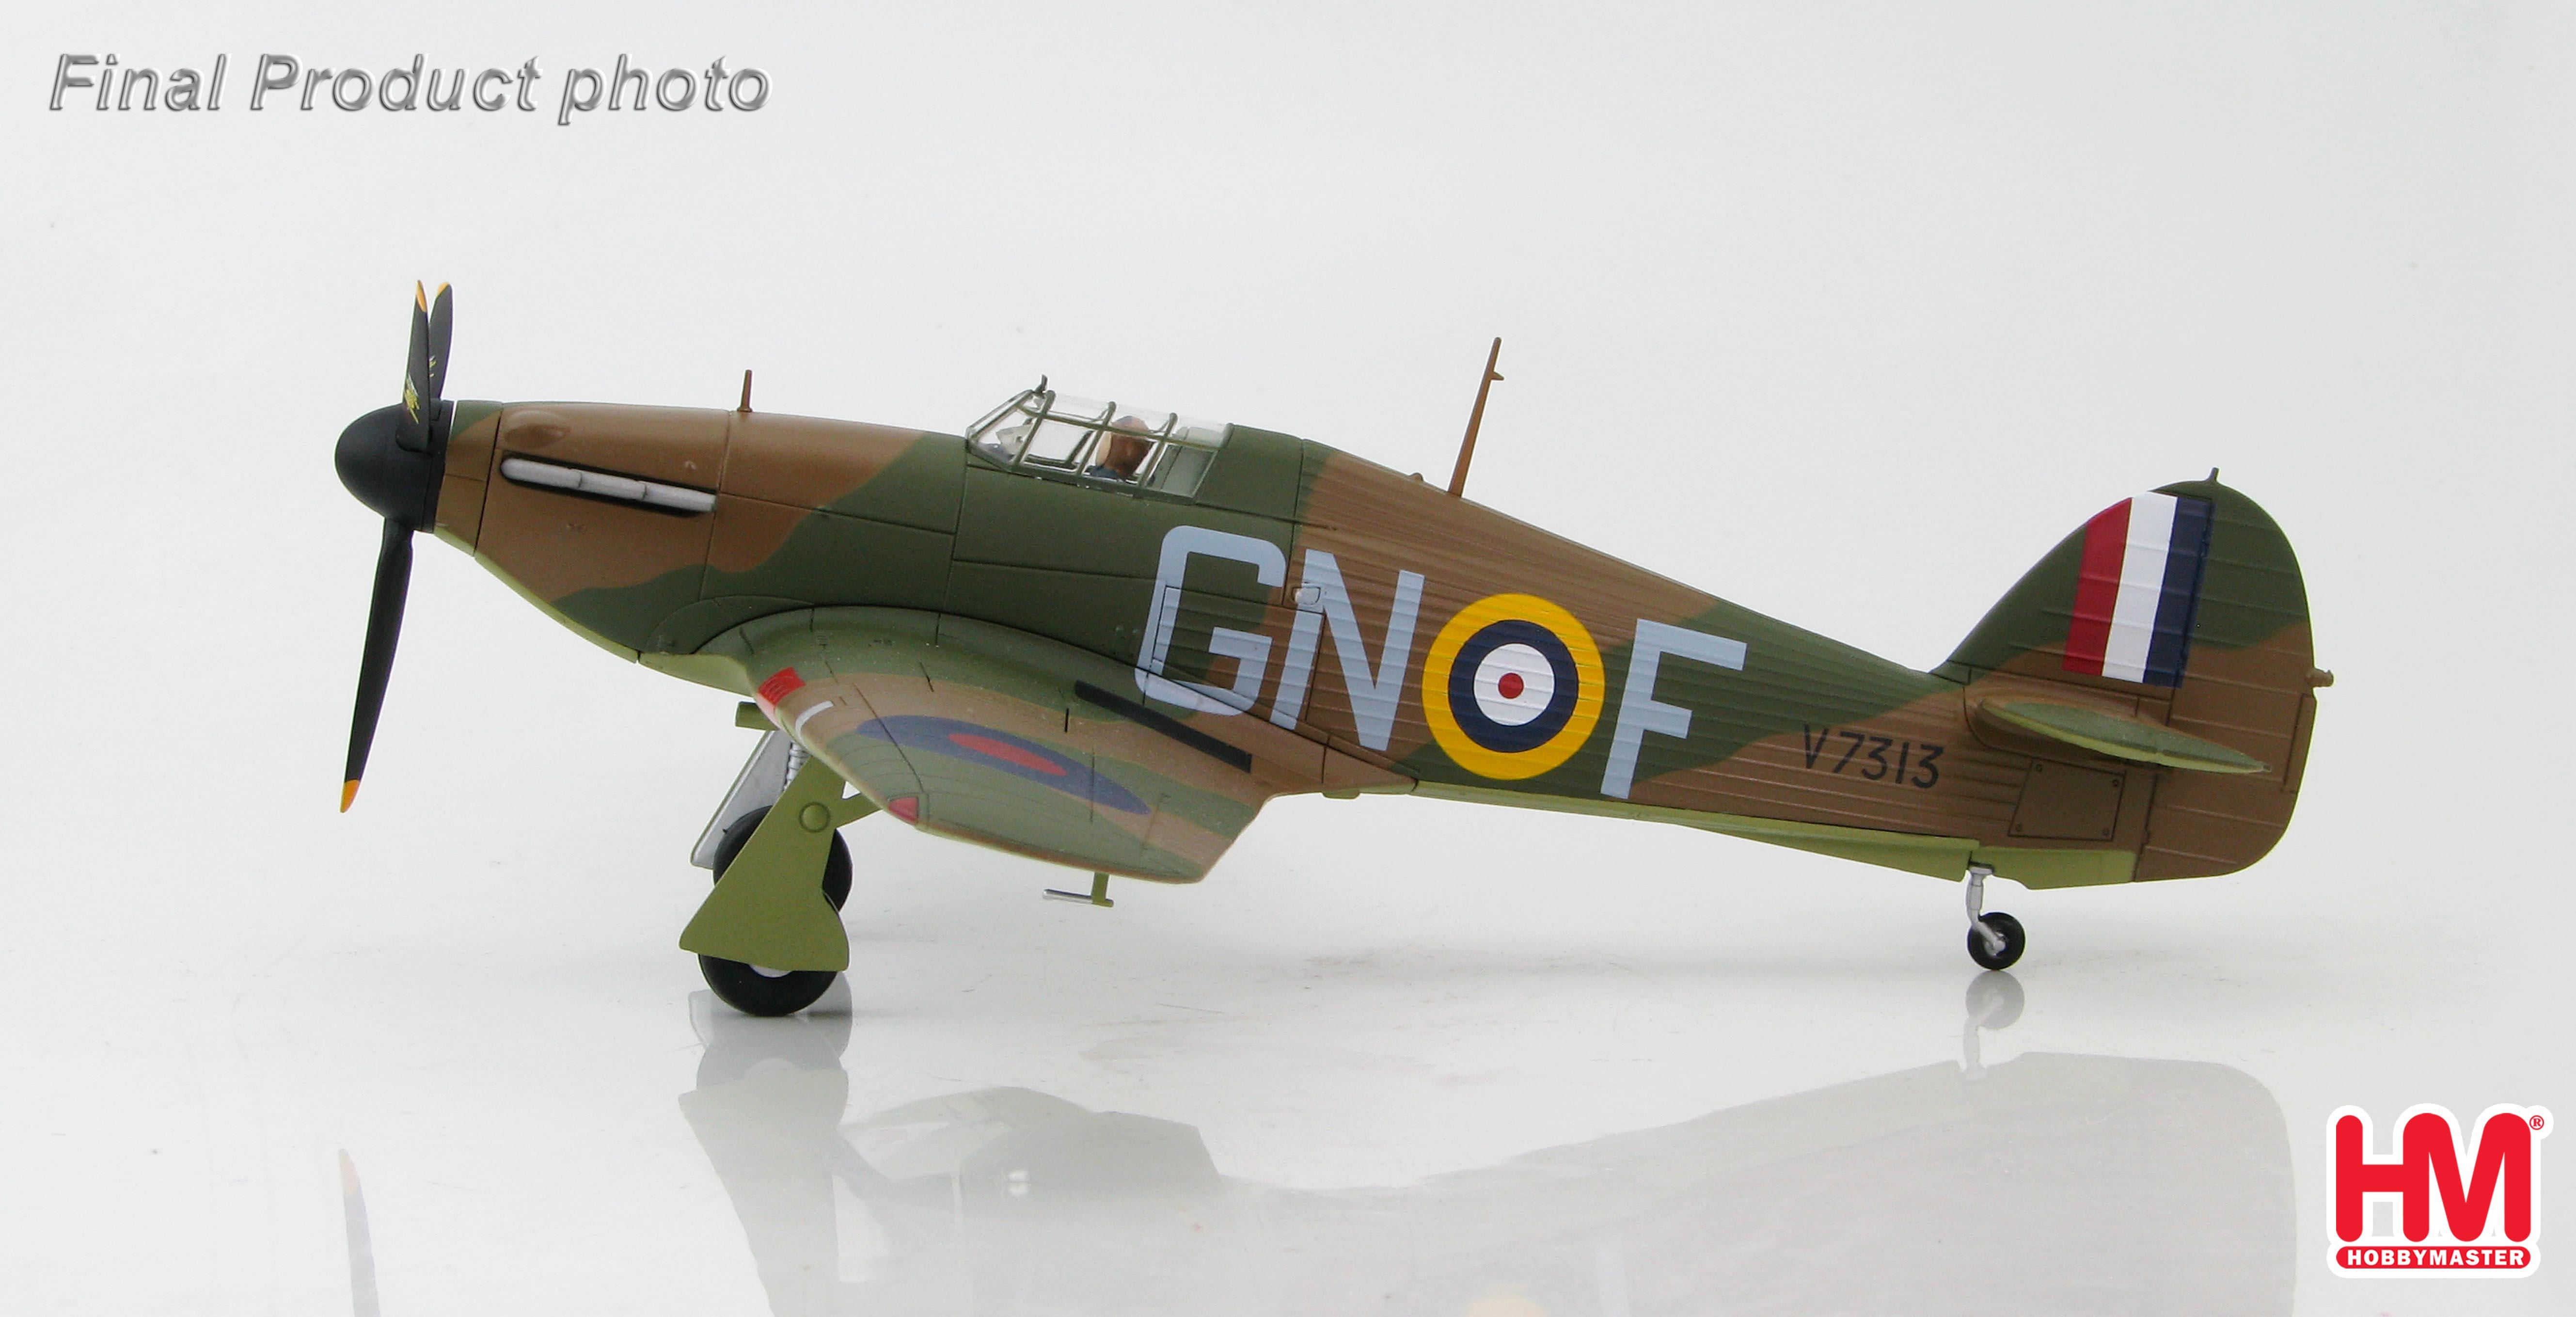 HA8604 Hawker Hurricane Mk.I GN-F, Plt Off Tom Neil, 249 Sqn., England 1940